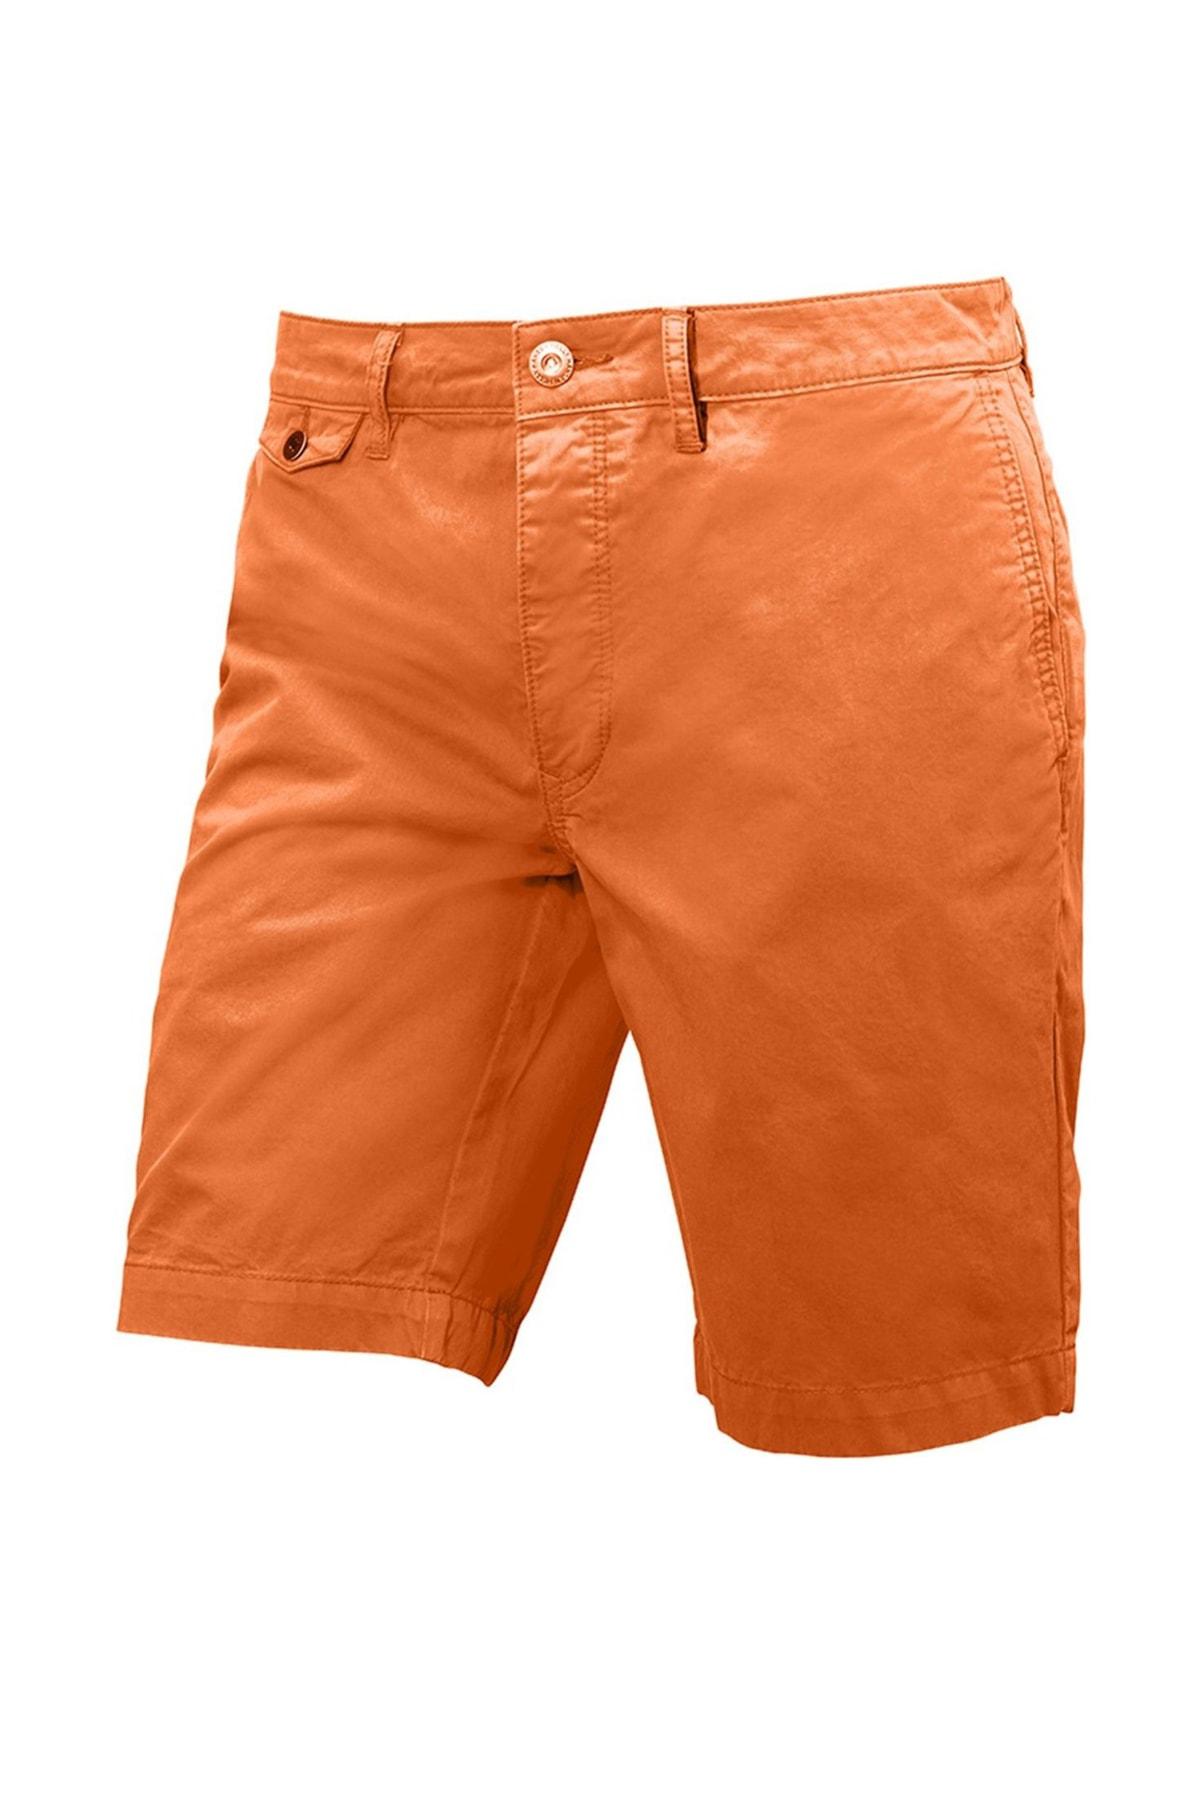 "Helly Hansen Bermuda Shorts 10"" Şort & Bermuda HHA.54135 1"